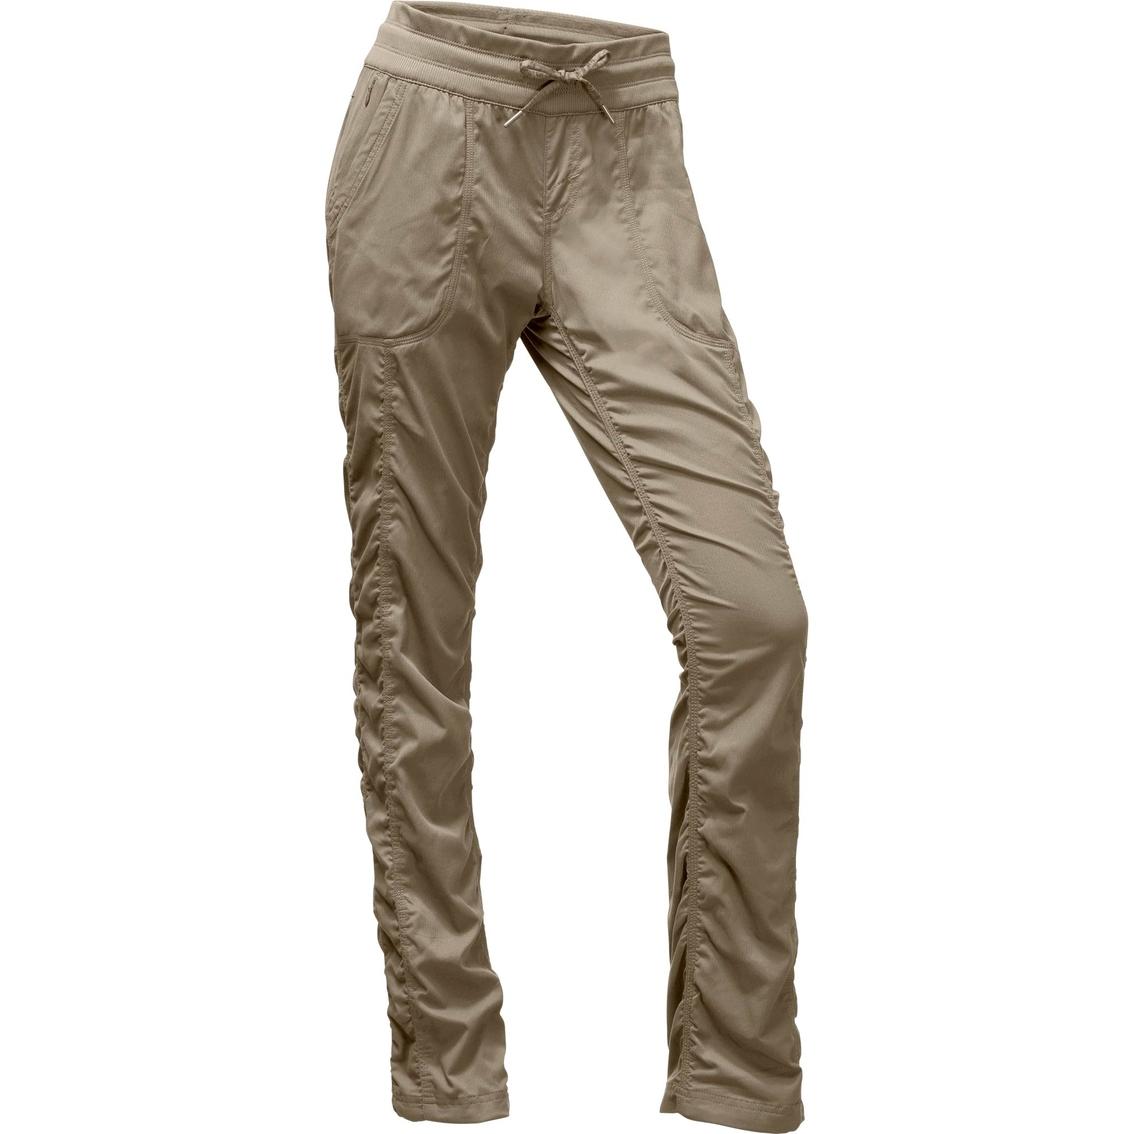 kupować nowe nieźle wspaniały wygląd The North Face Aphrodite Hiking Pants | Pants & Capris ...